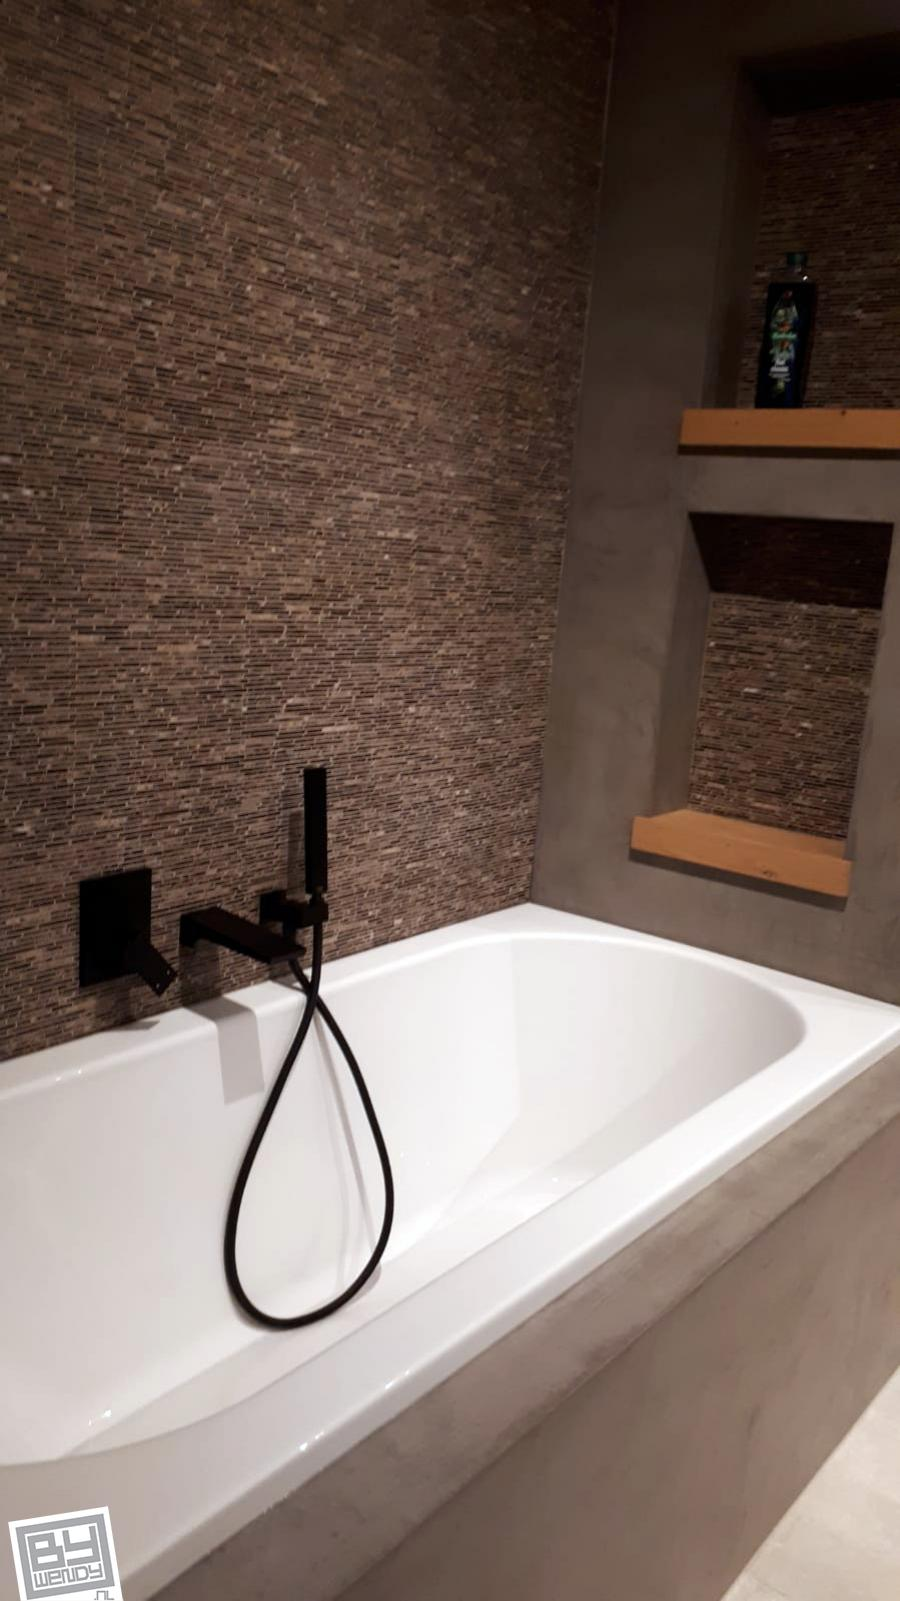 Badkamer en toiletten, wendyschoenaker.nl, Tilburg